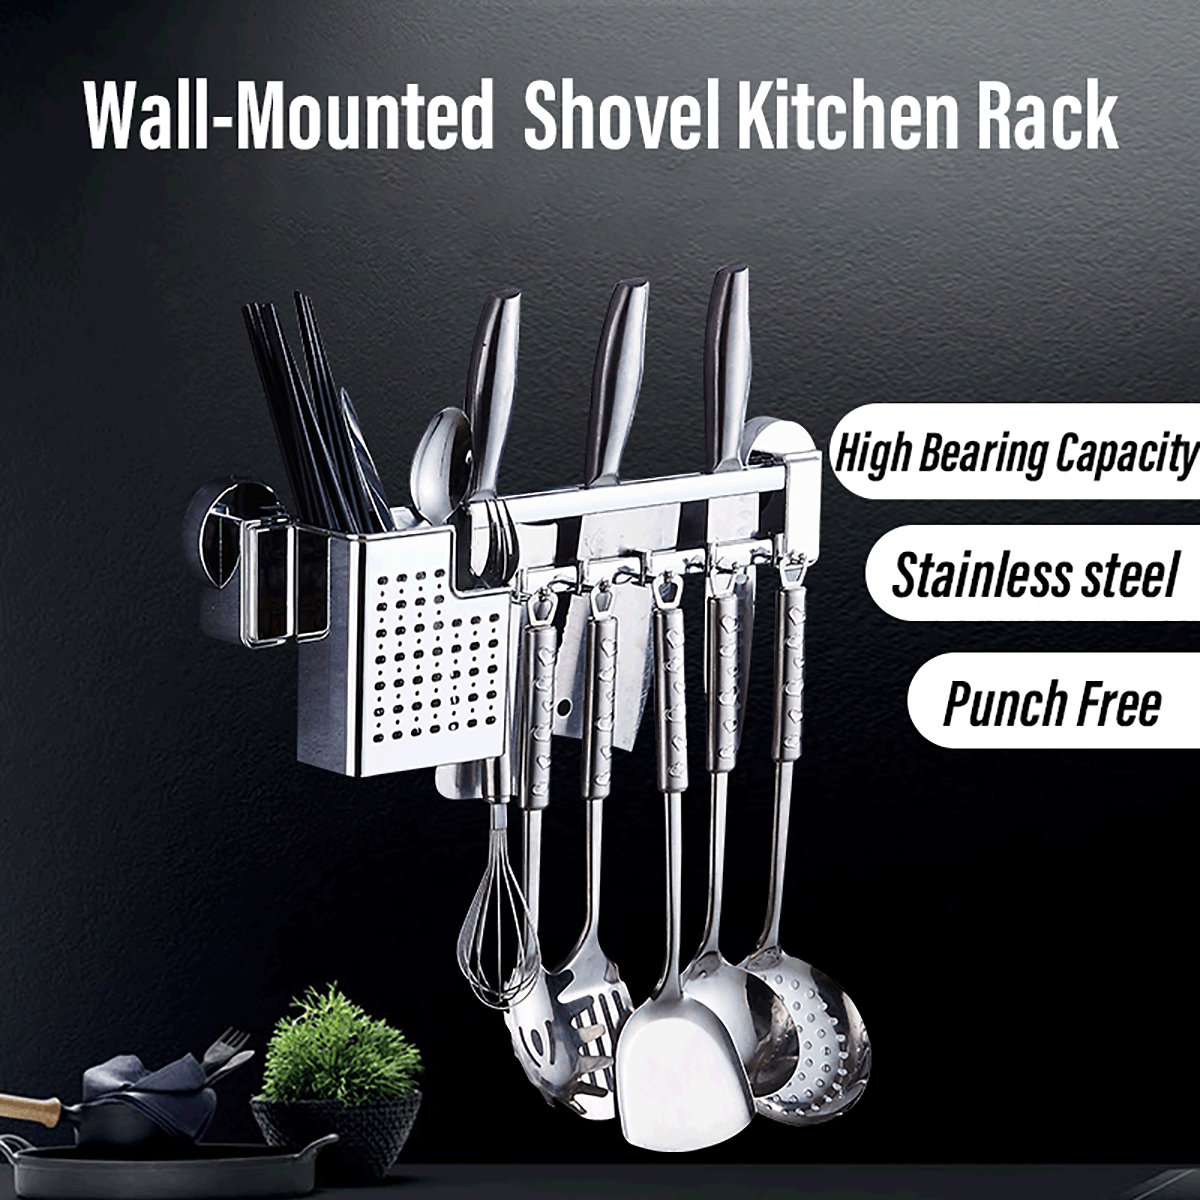 Stainless Steel Kitchen Racks Seamless Wall Hanging Chopsticks Kitchenware Combination Storage Rack